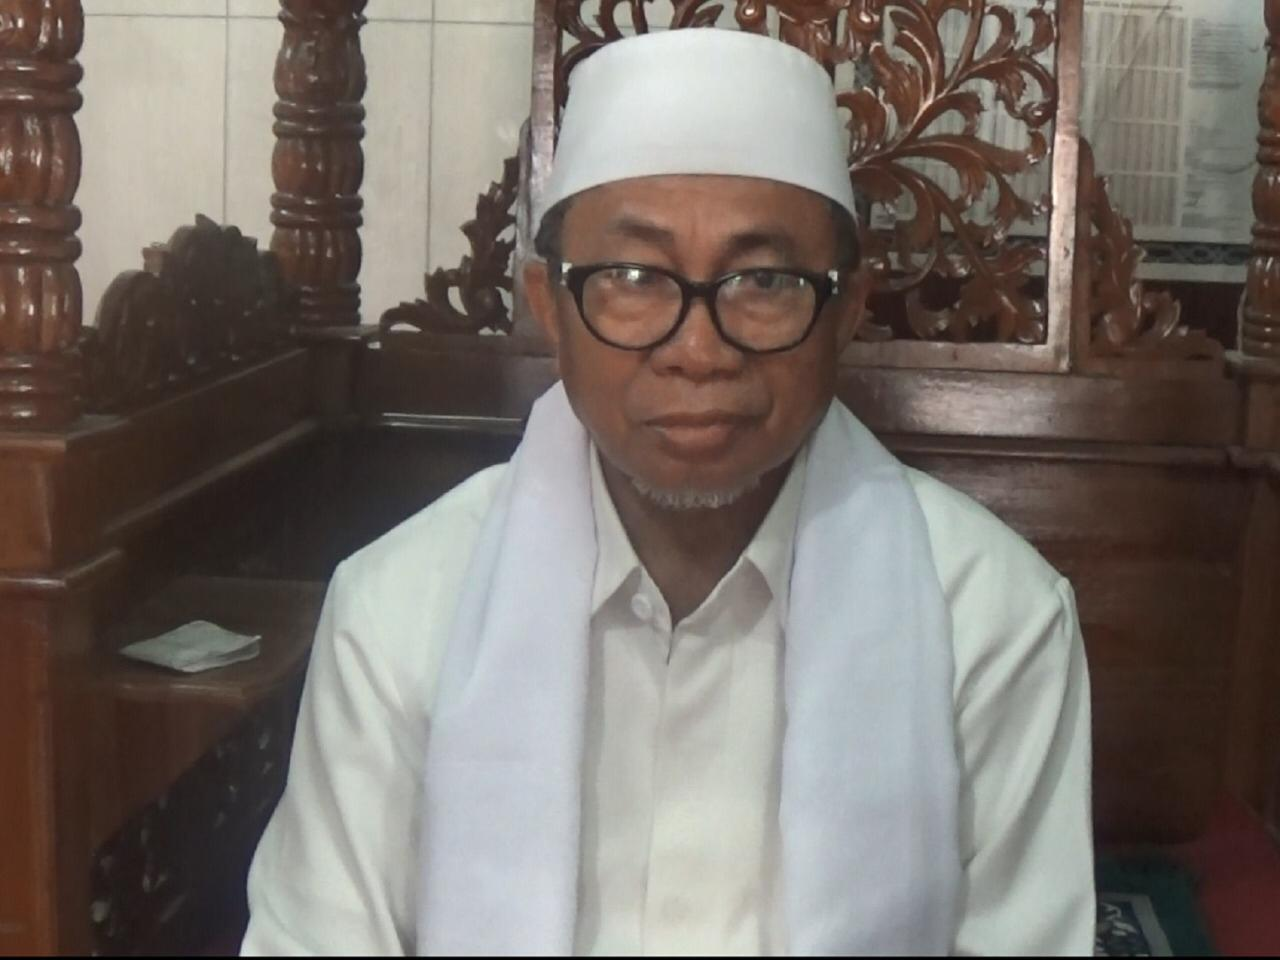 Ketua Majelis Ulama Indonesia (MUI) Provinsi Sulawesi Utara KH Abd Wahab Abd Gafur, Lc.